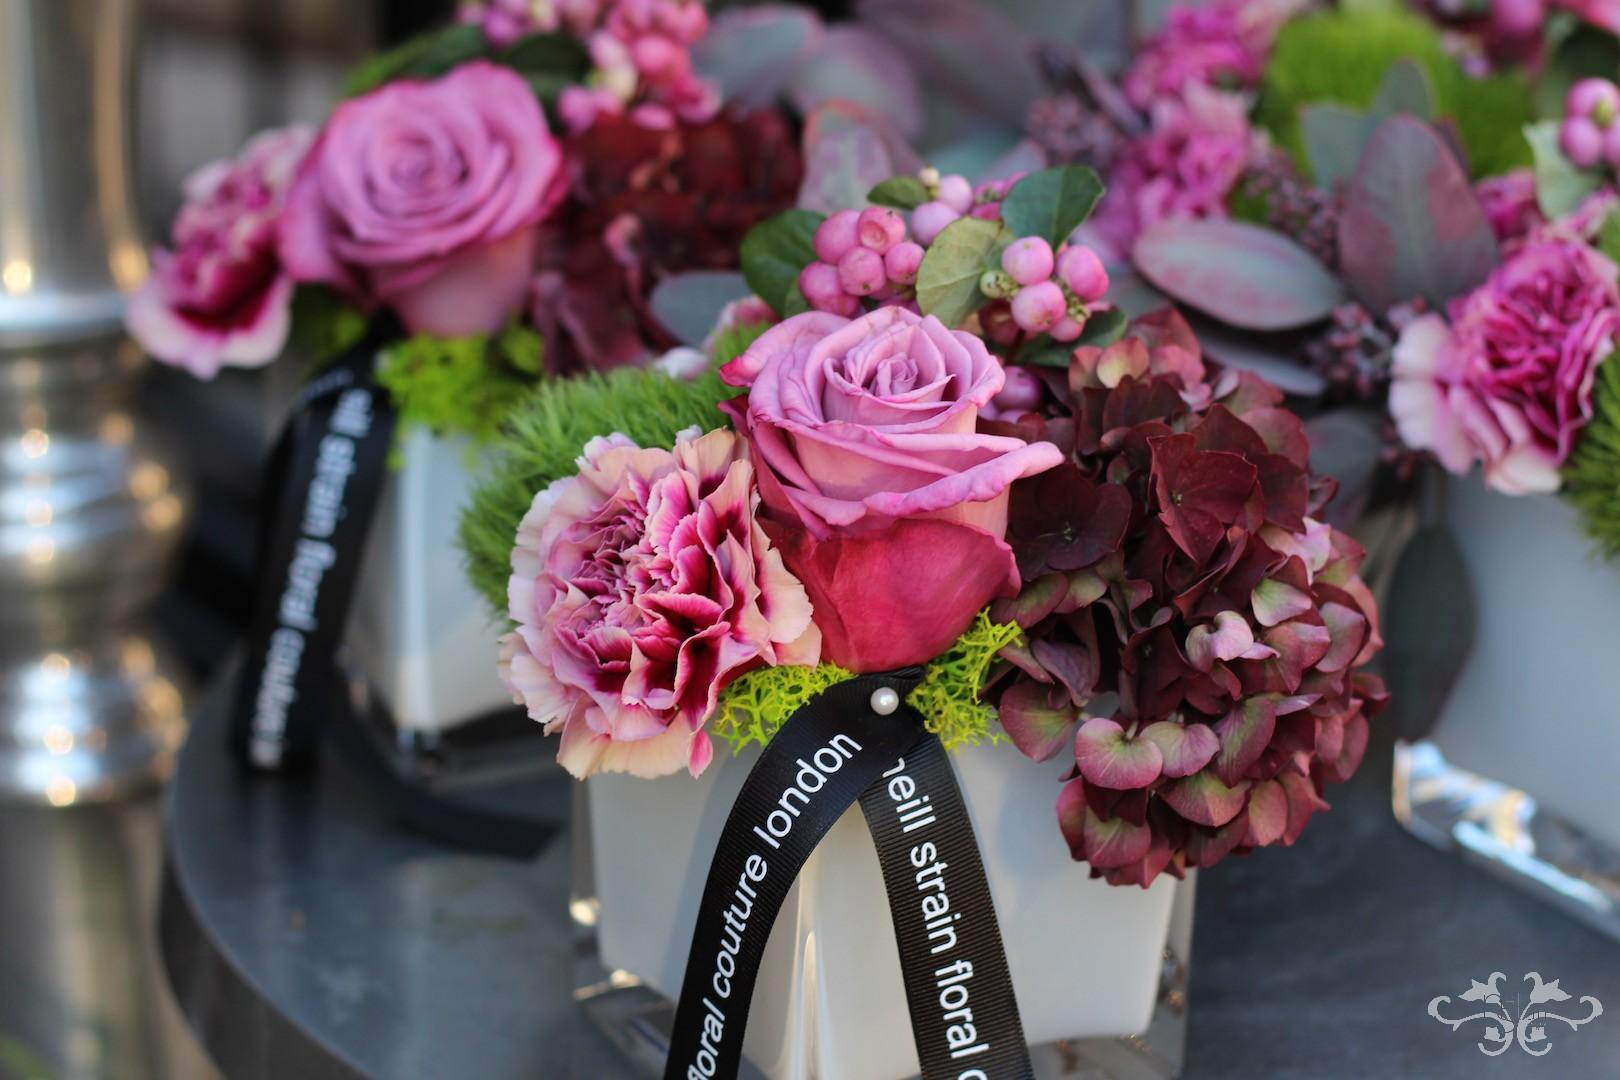 Thanksgiving floral arrangements Neill Strain Belgravia Knightsbridge